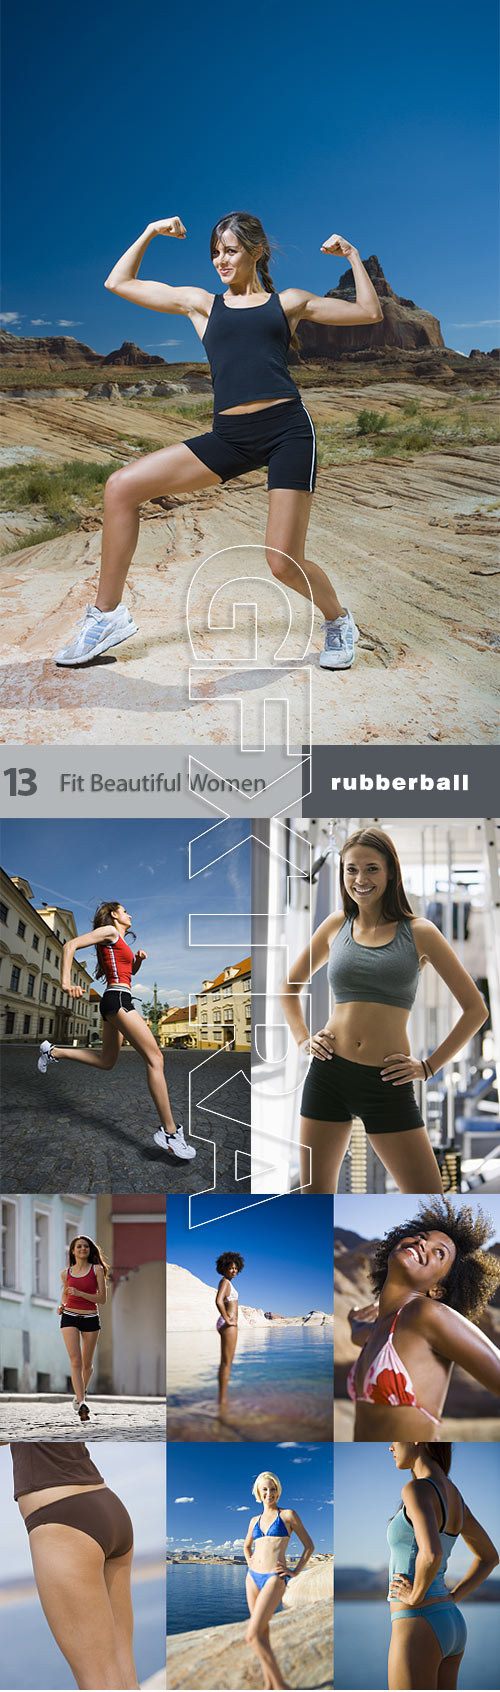 RubberBall 013 Fit Beautiful Women